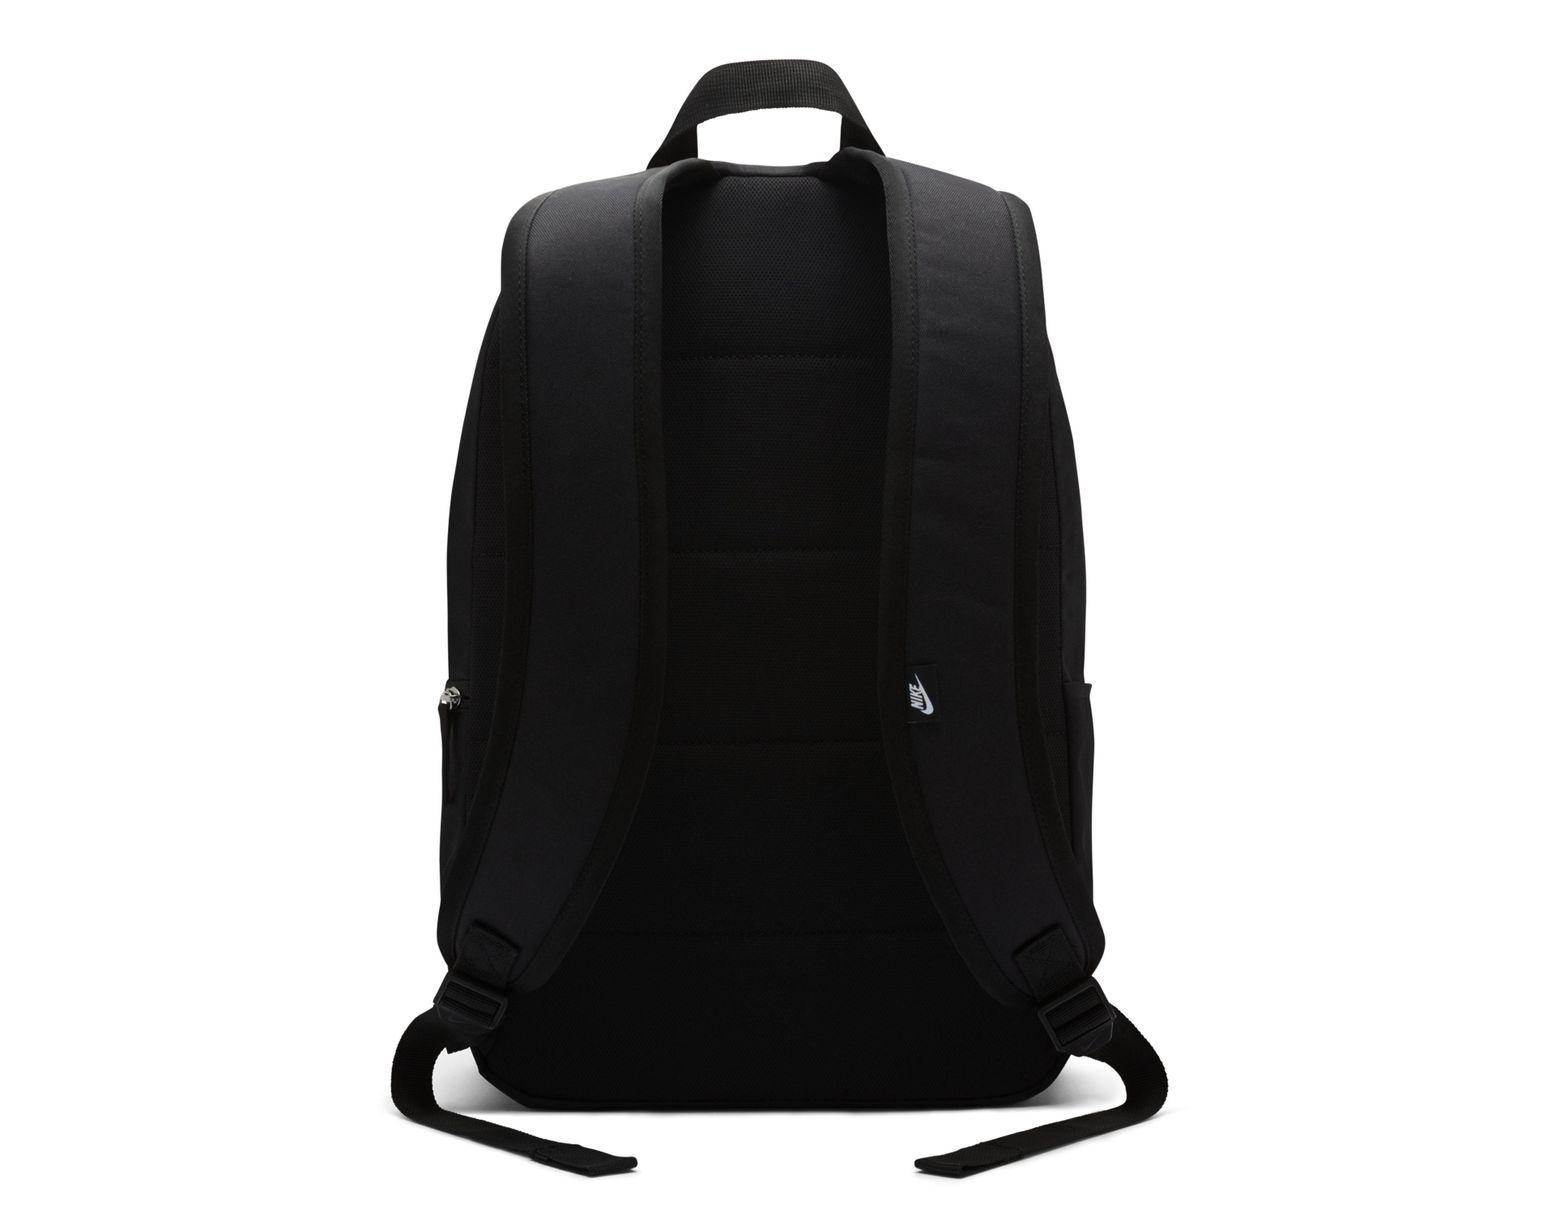 7d0271ebd5 Nike English Premier League Football Backpack in Black for Men - Lyst